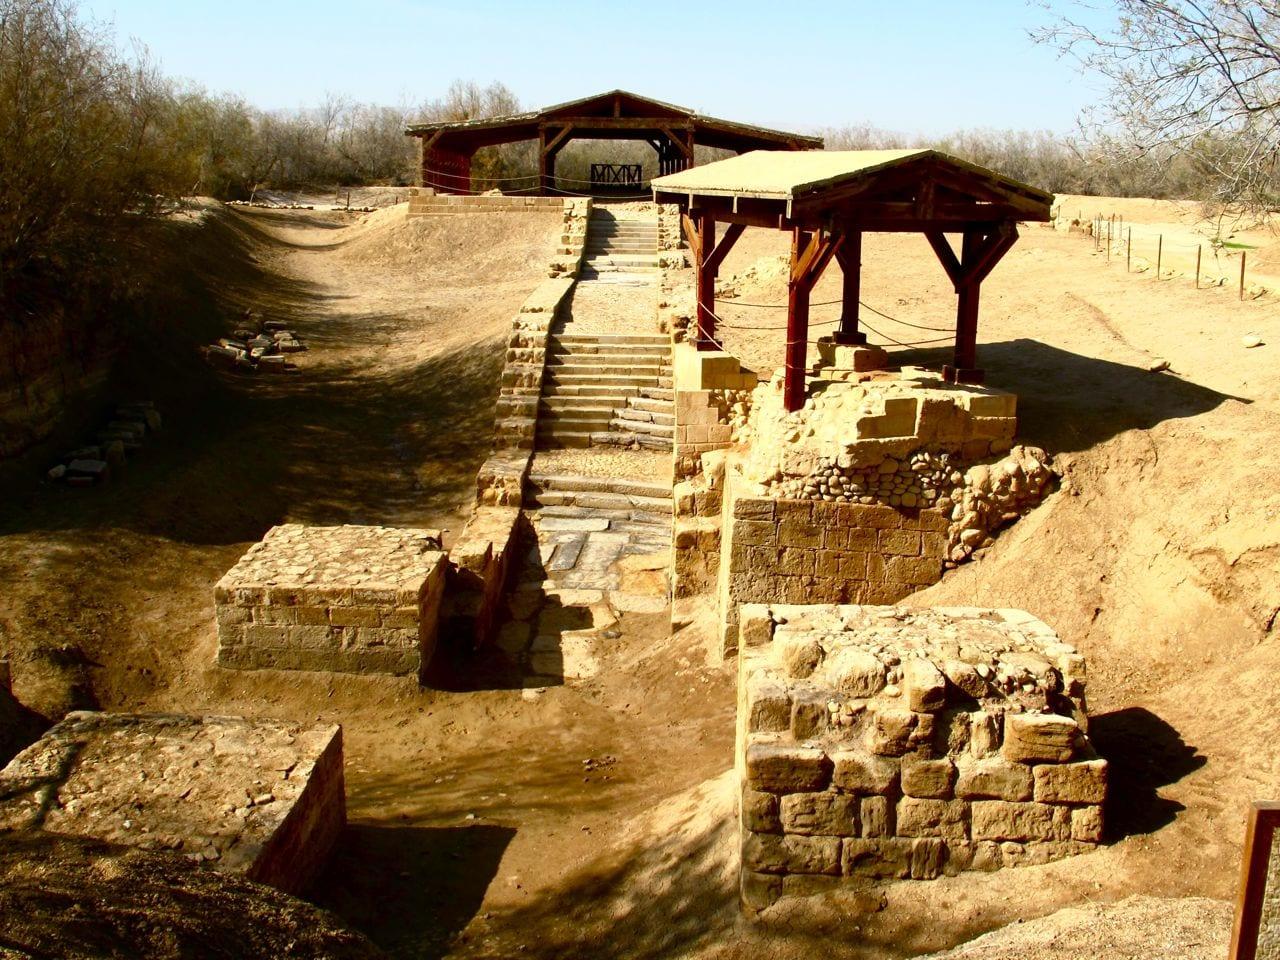 bethany beyond the jordan the baptism site of jesus